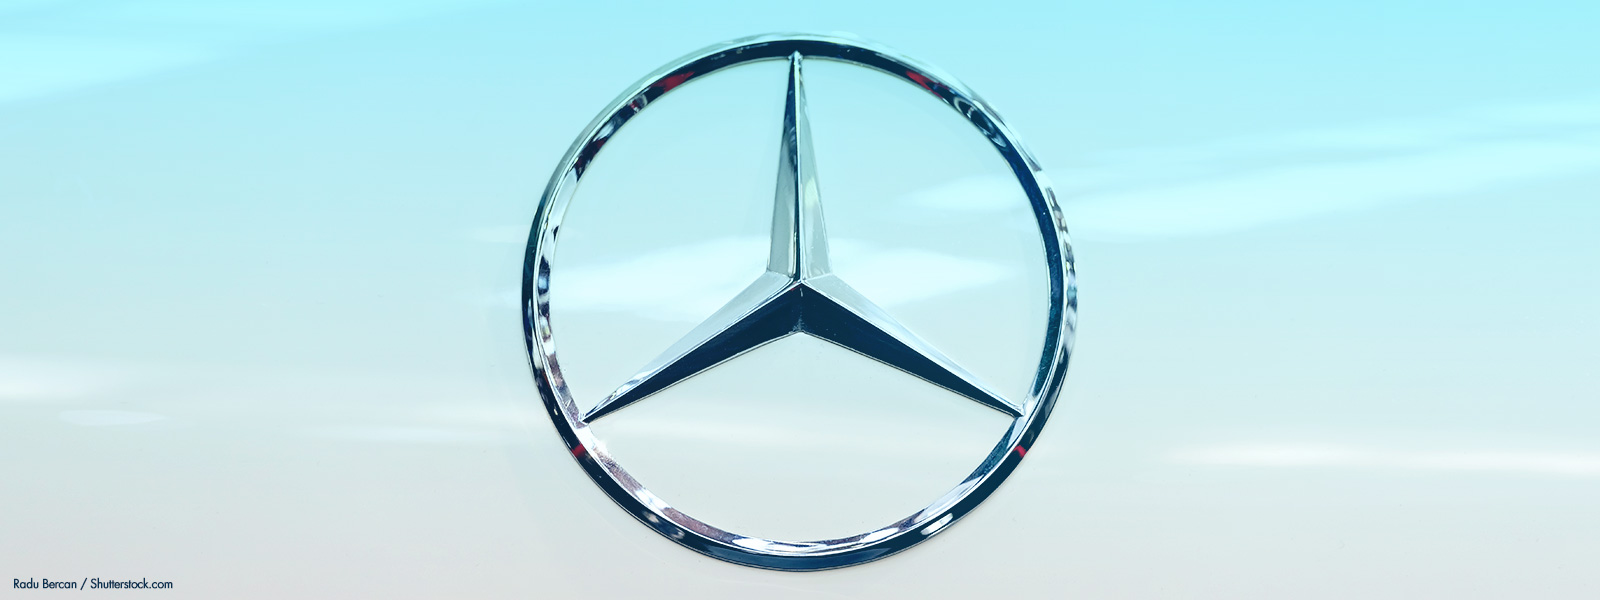 Mercedes busca se consolidar no mercado de carros elétricos